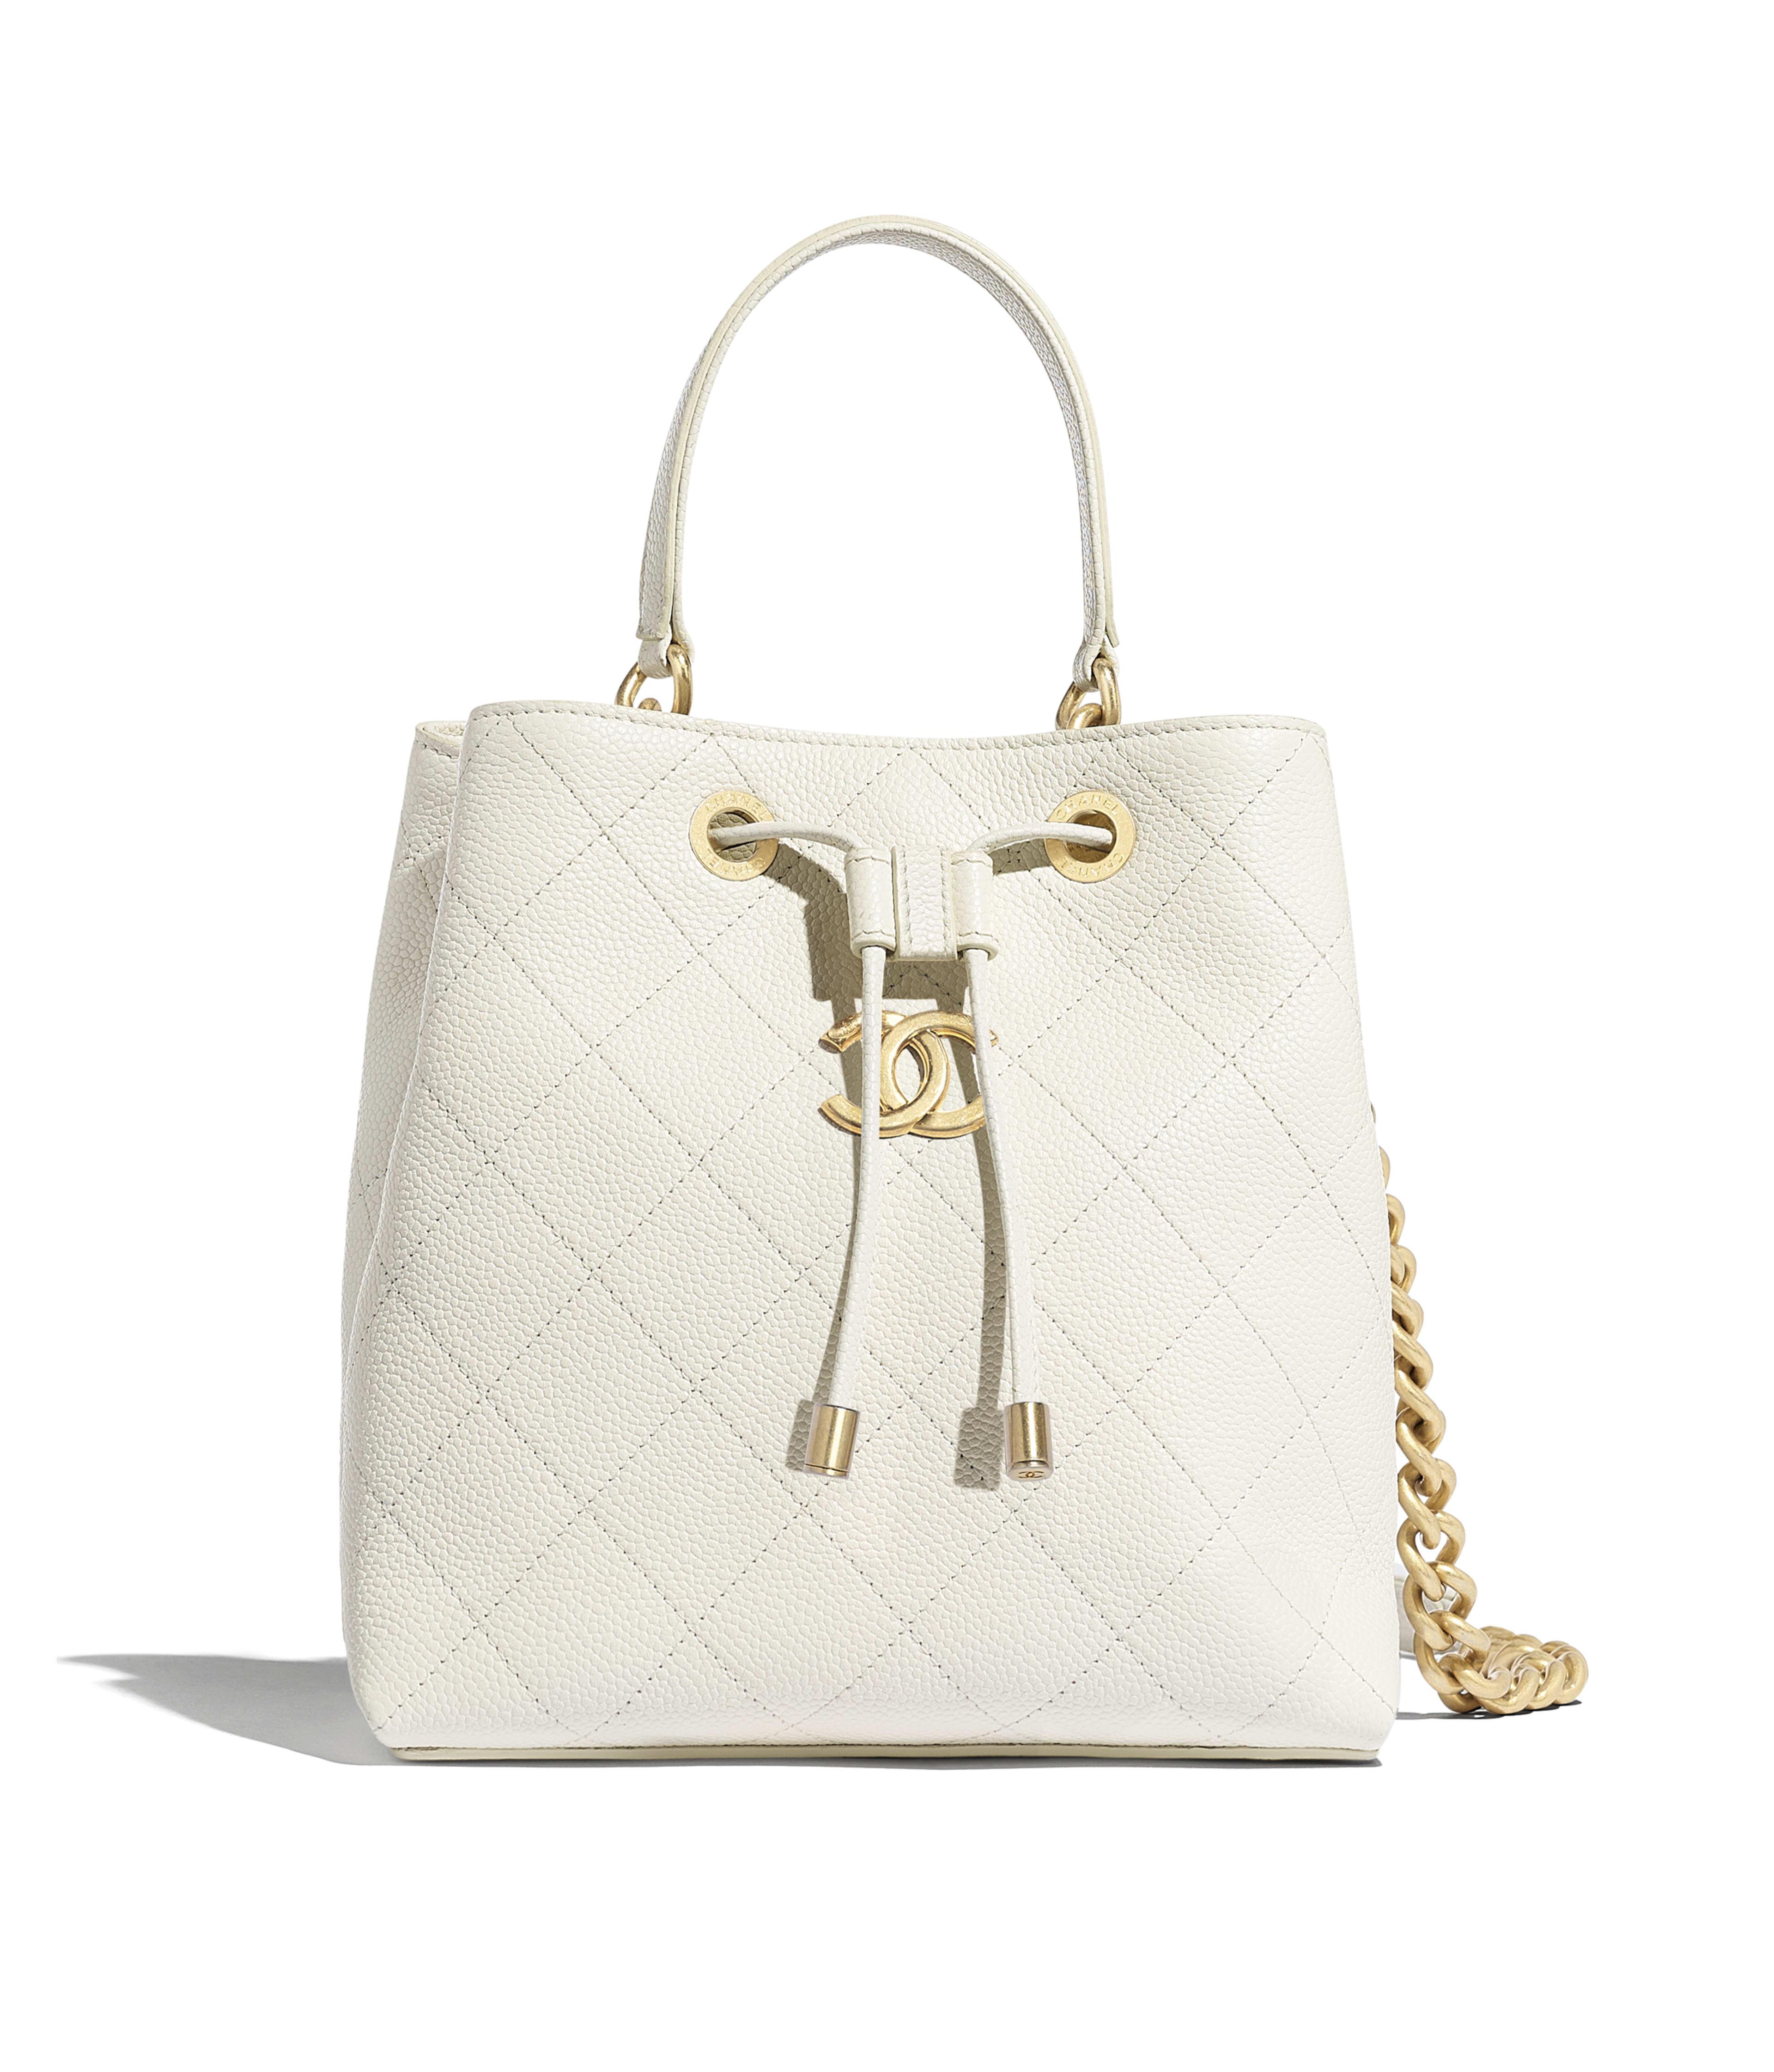 6782a87203be Drawstring Bag Grained Calfskin & Gold-Tone Metal, White Ref.  AS0310B0017010601